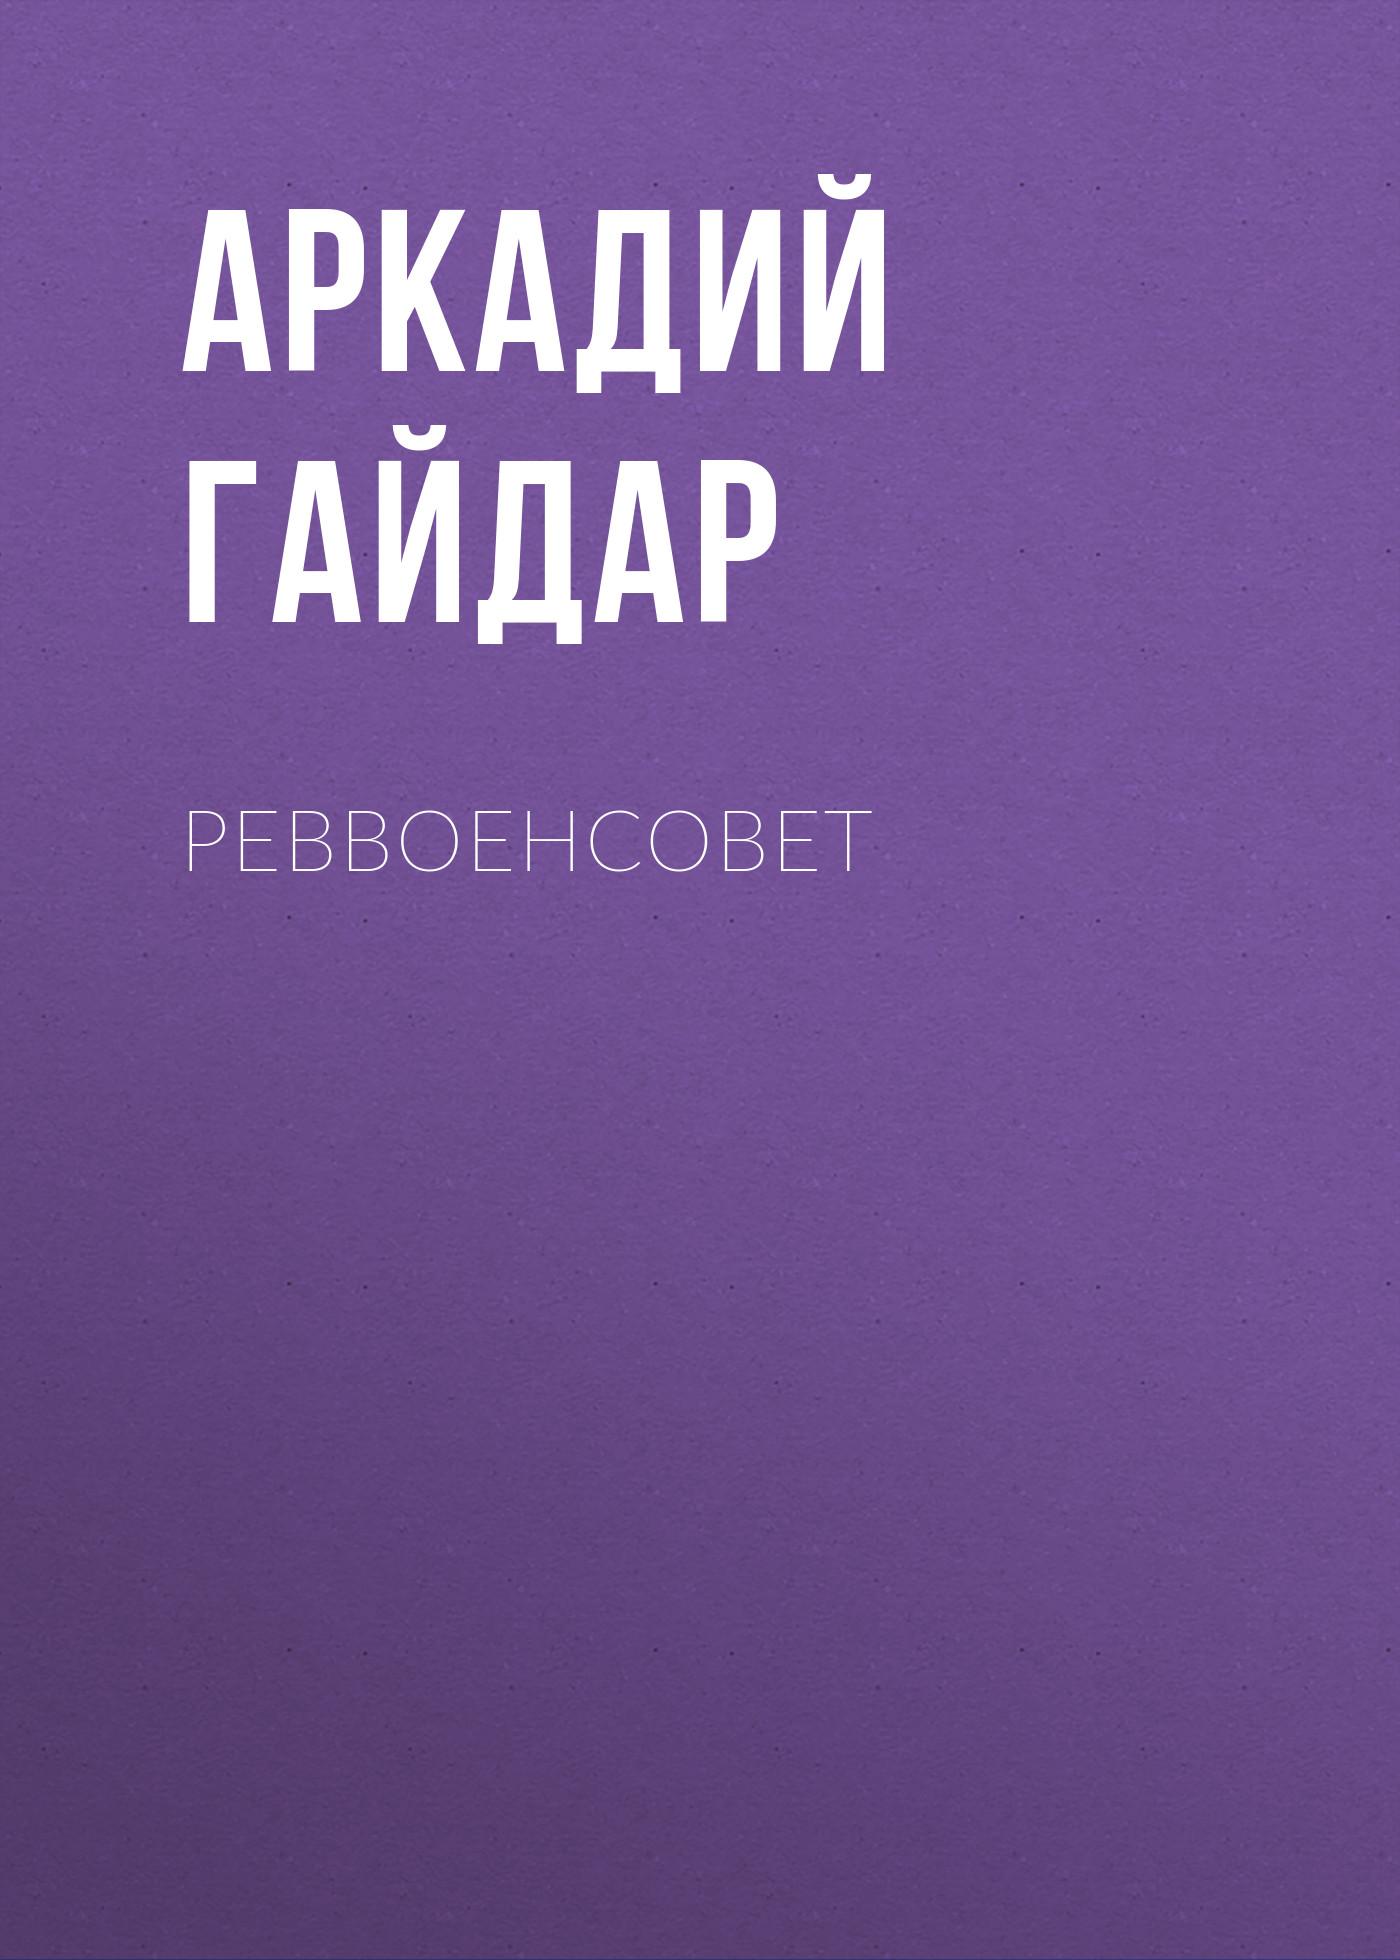 Аркадий Гайдар Реввоенсовет аркадий гайдар проводы